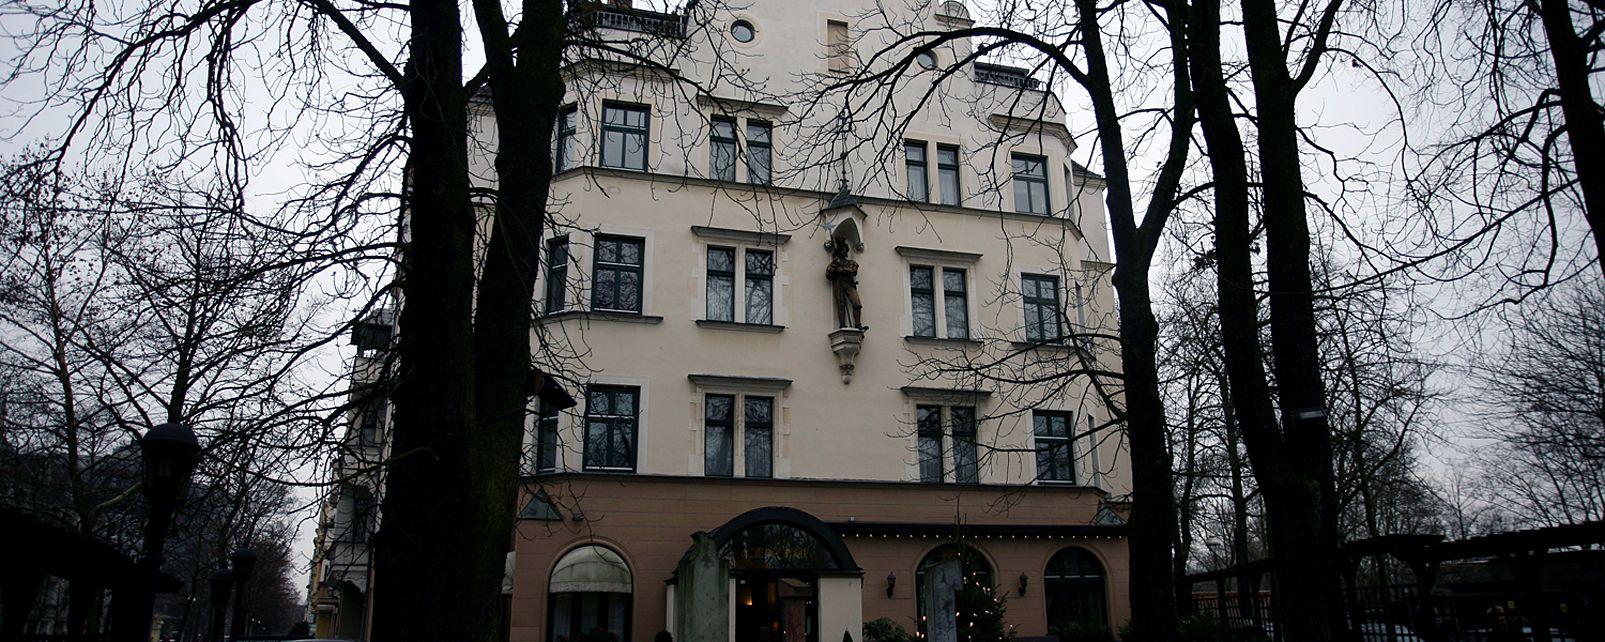 Hotel Romantik Kronprinz Berlin